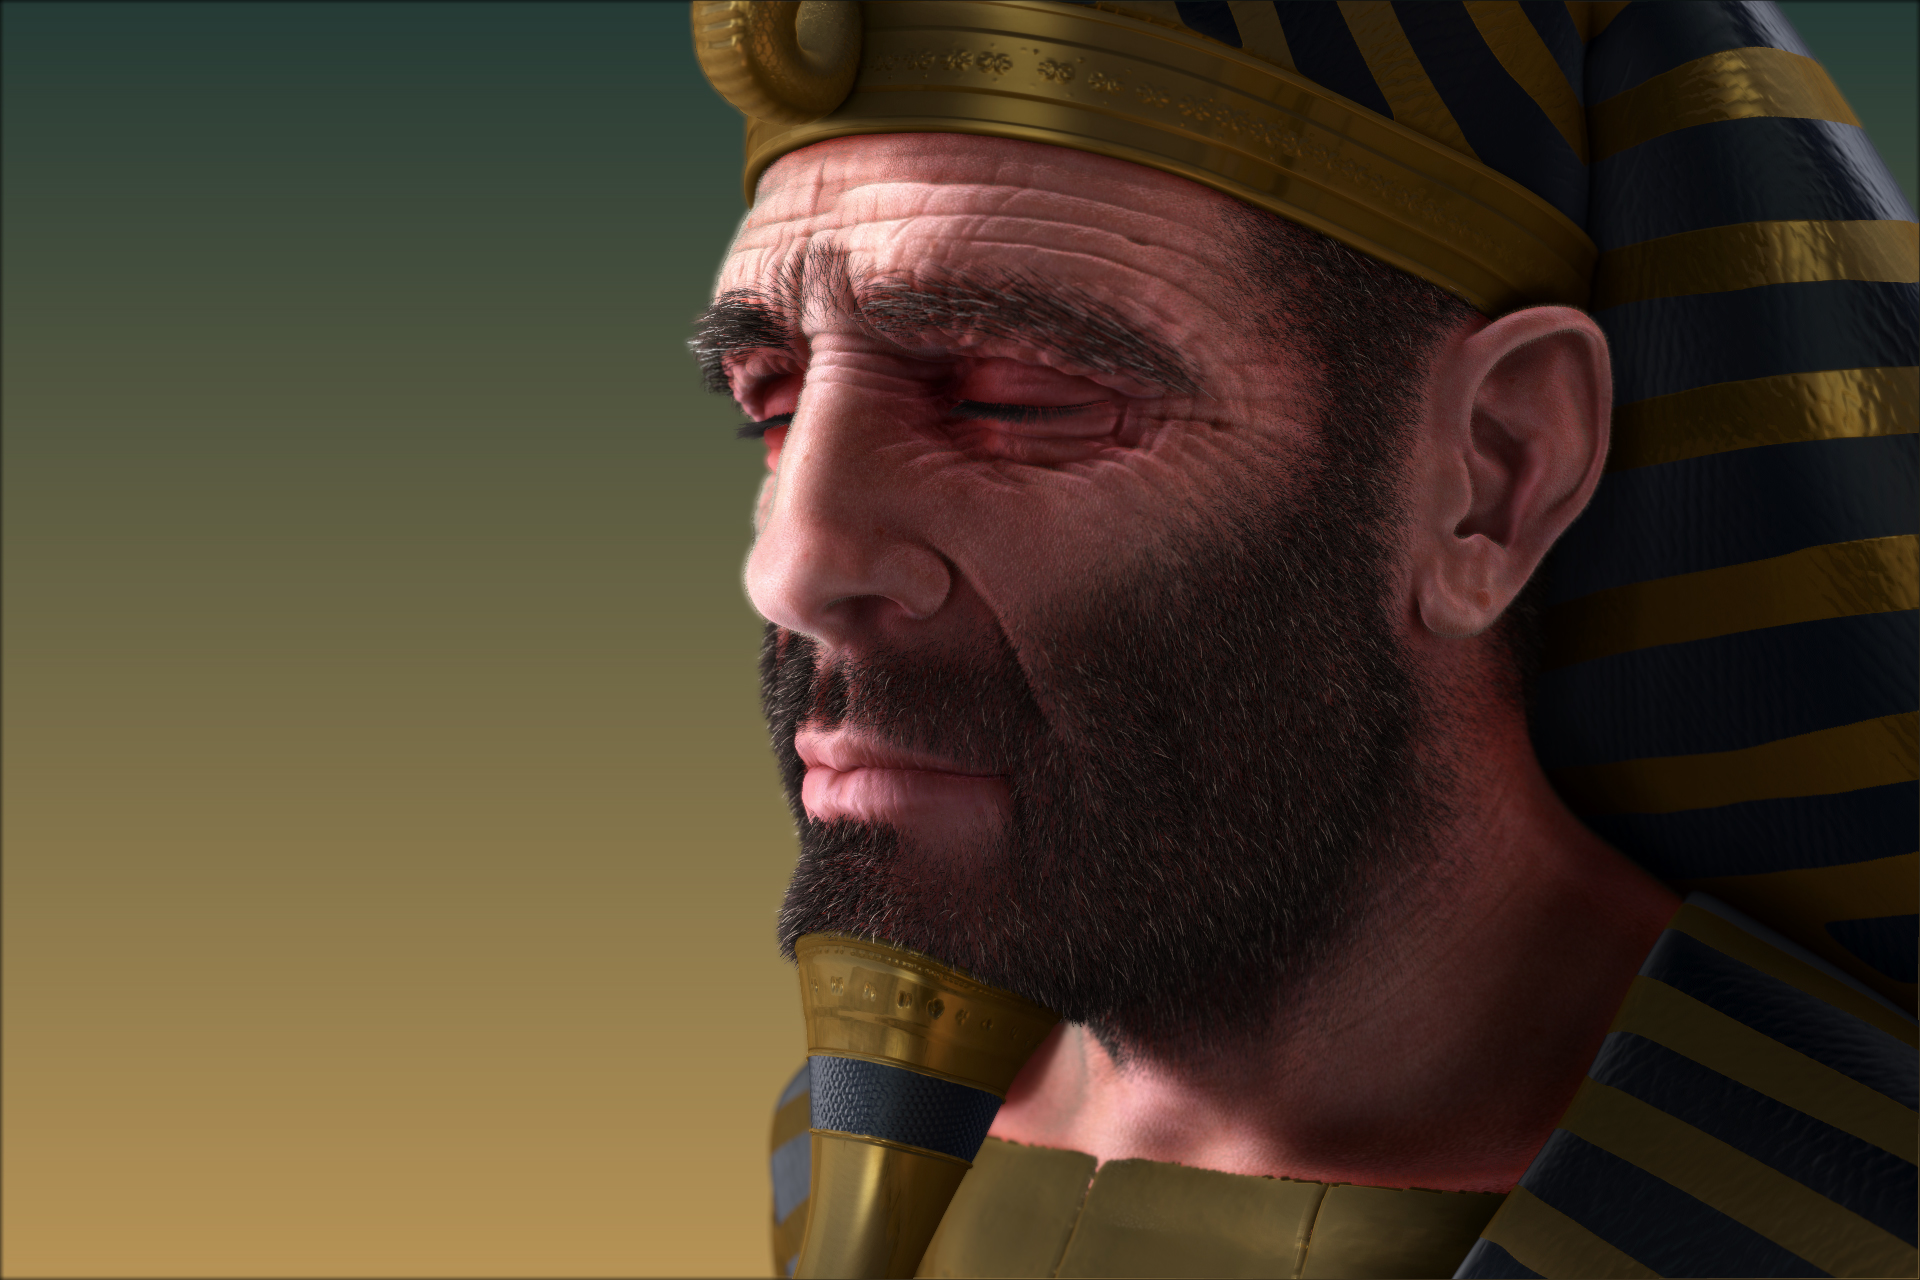 pepi ii - Just for fun: Pharaoh